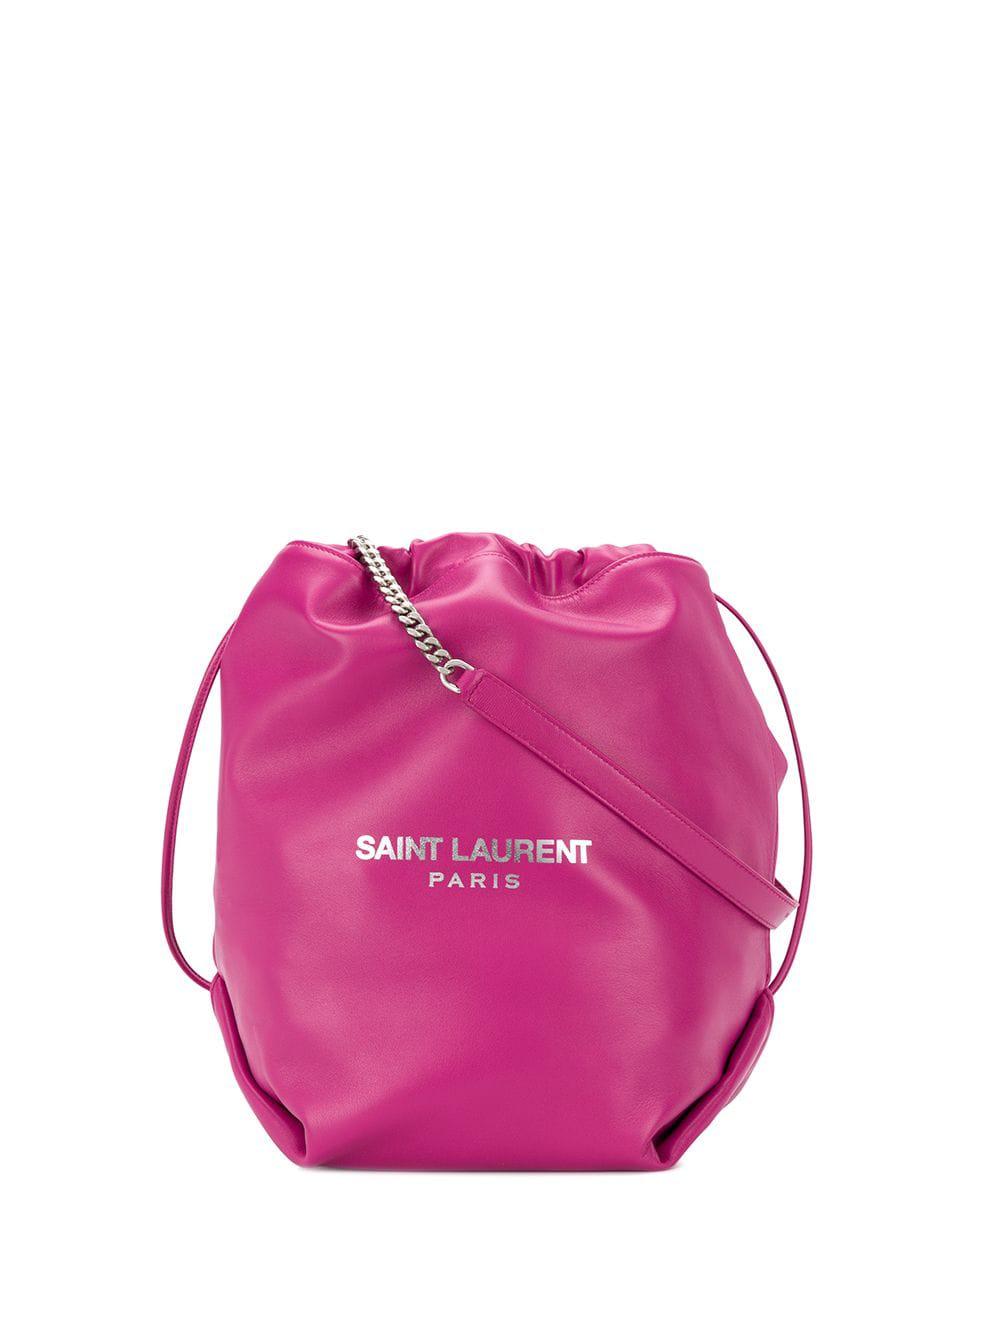 Store Status Price. Saint Laurent Drawstring Bucket Shoulder Bag - Pink 68327e79c52ef